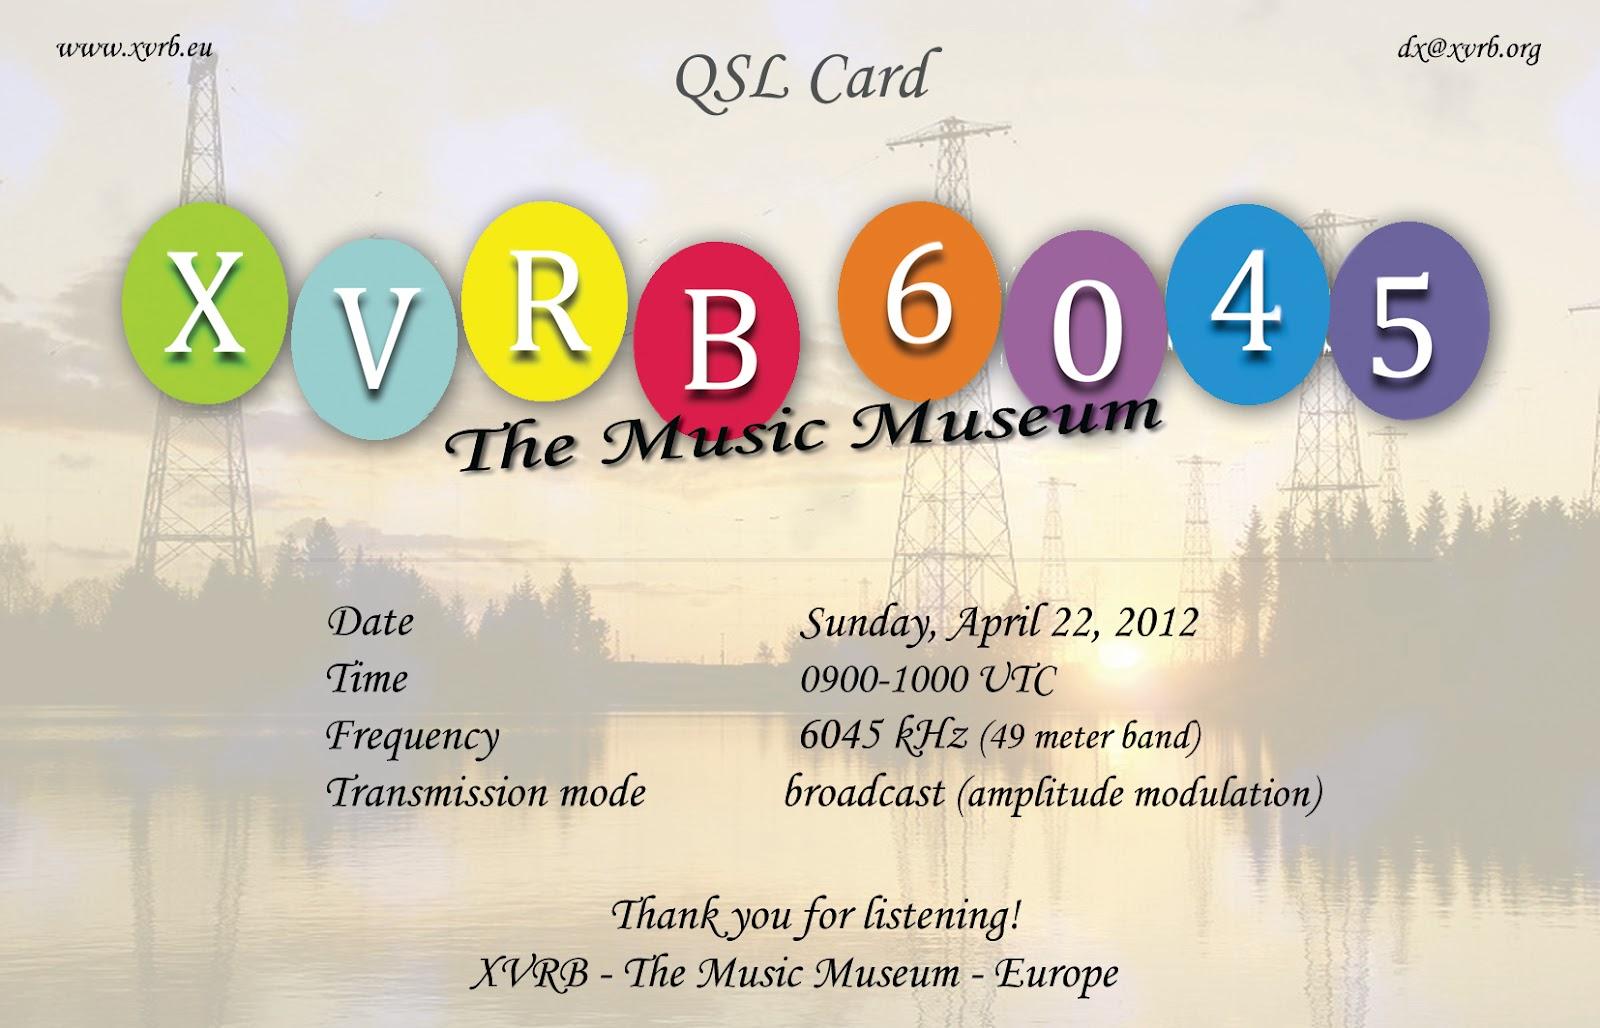 XVRB QSL card.jpg